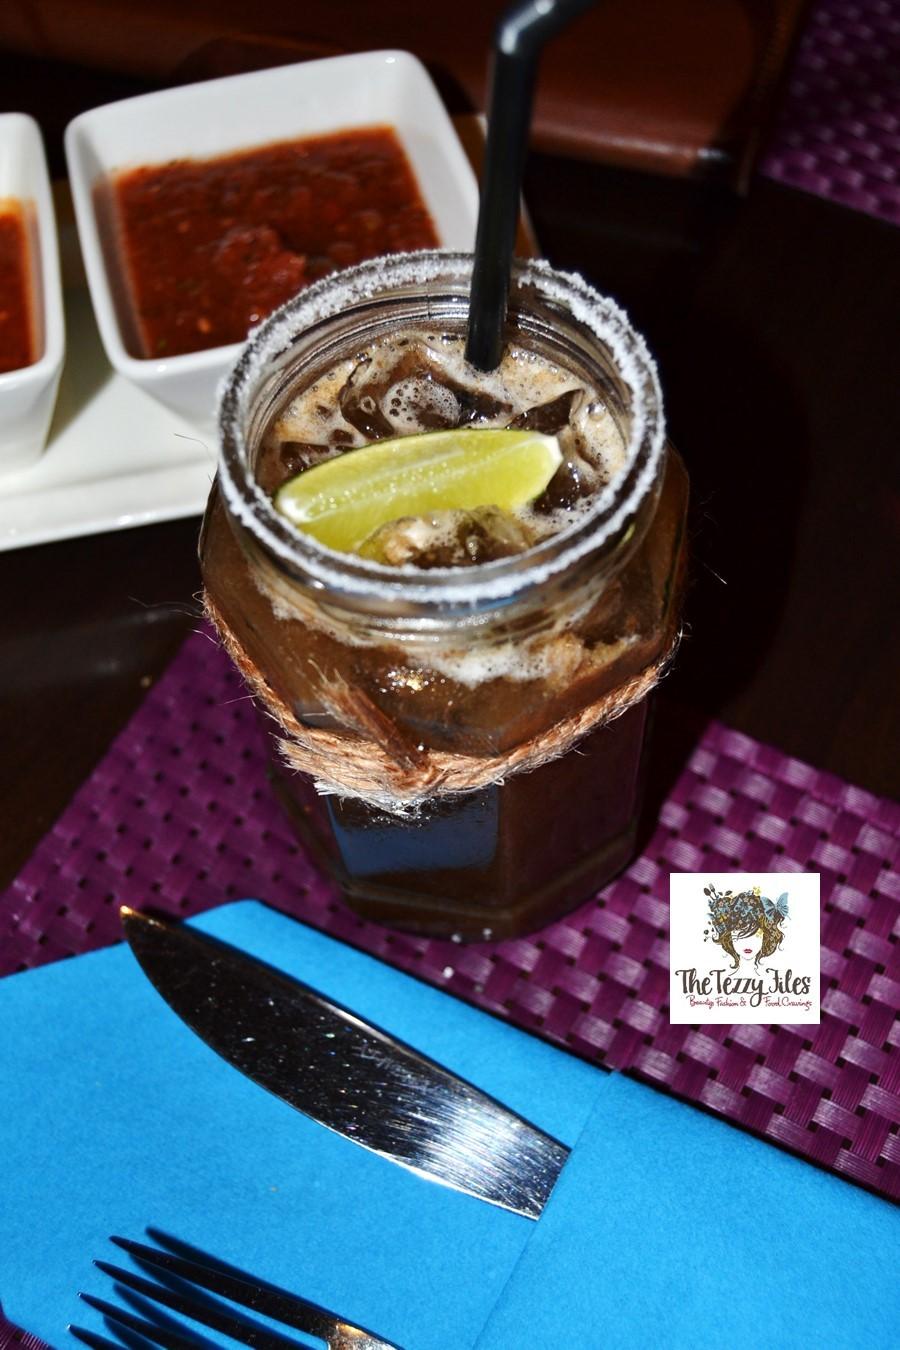 fuego contemporary mexicn restaurant souk al bahar dubai uae food blog review frida kalho guacamole recipe fine dining food blogger (22)